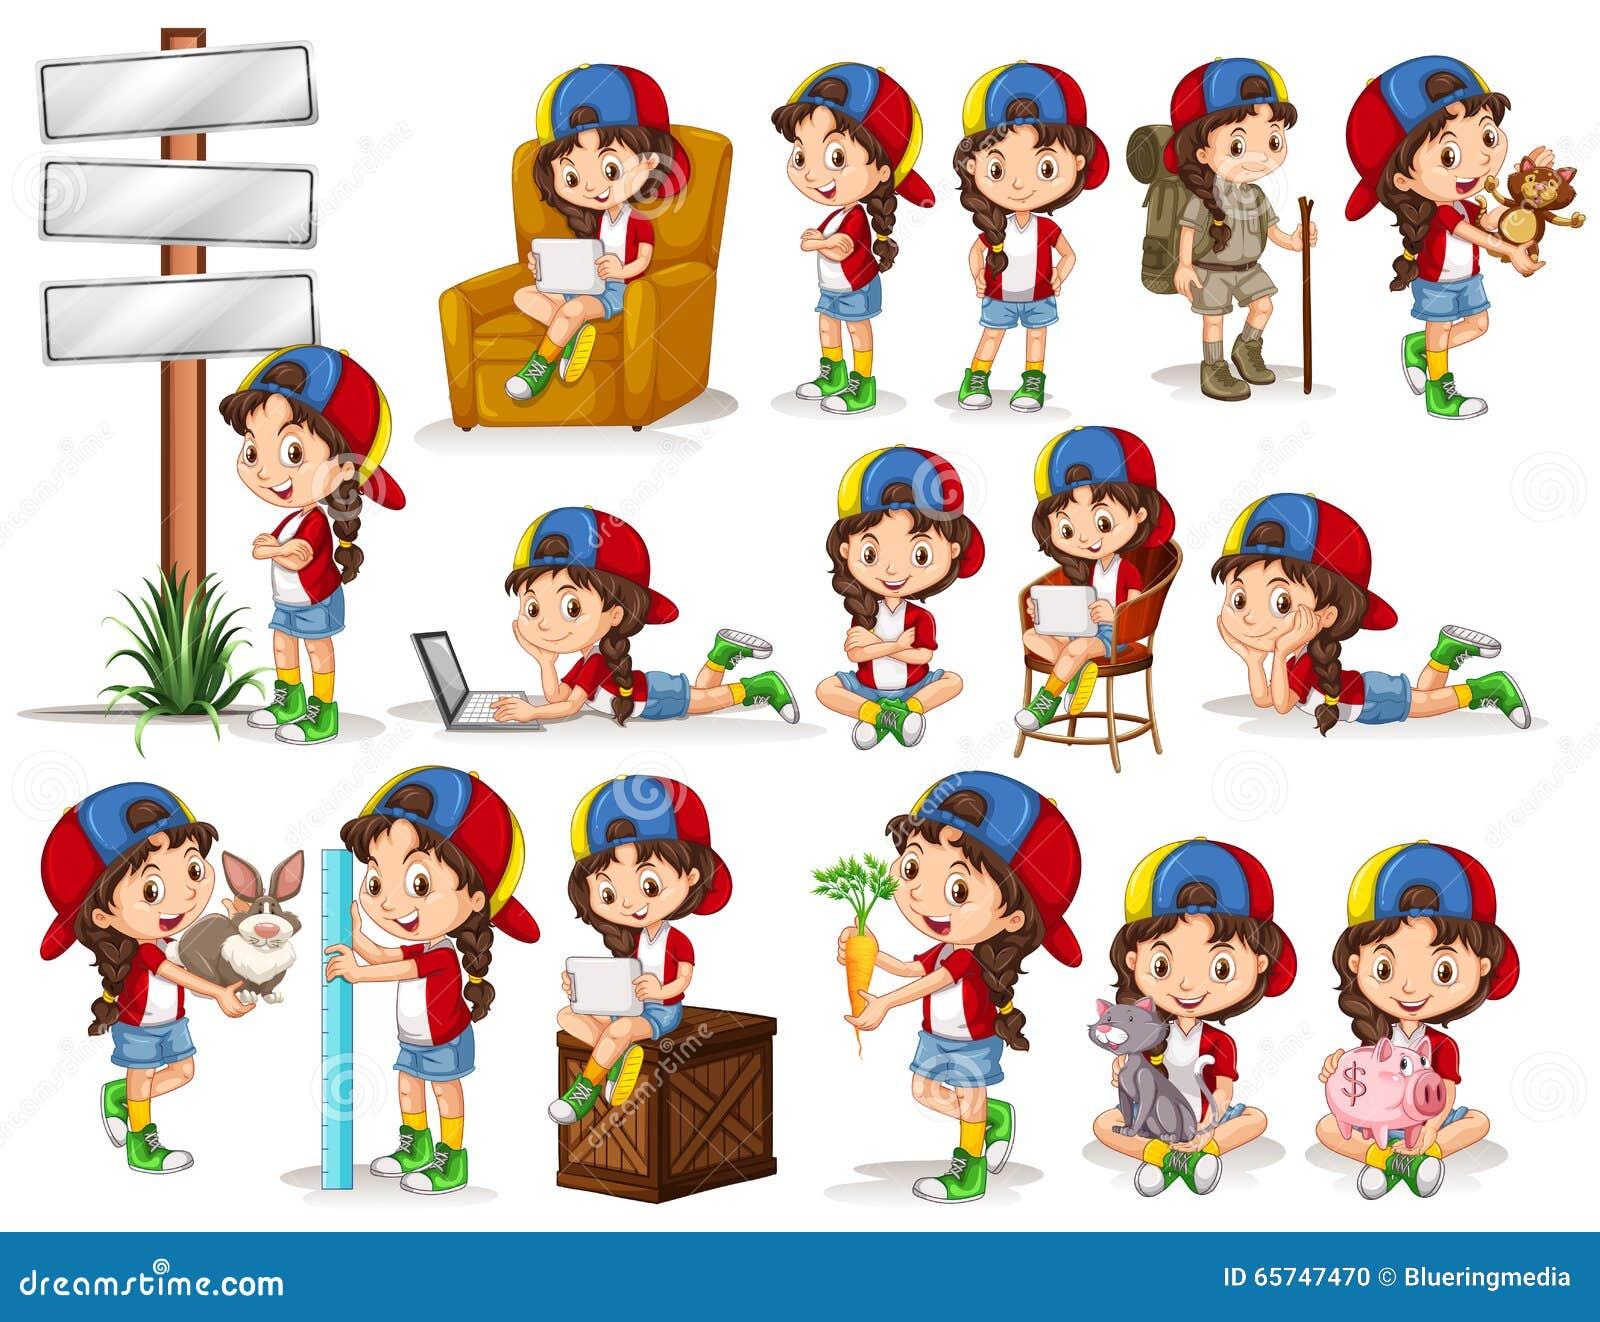 Little girl doing different activities